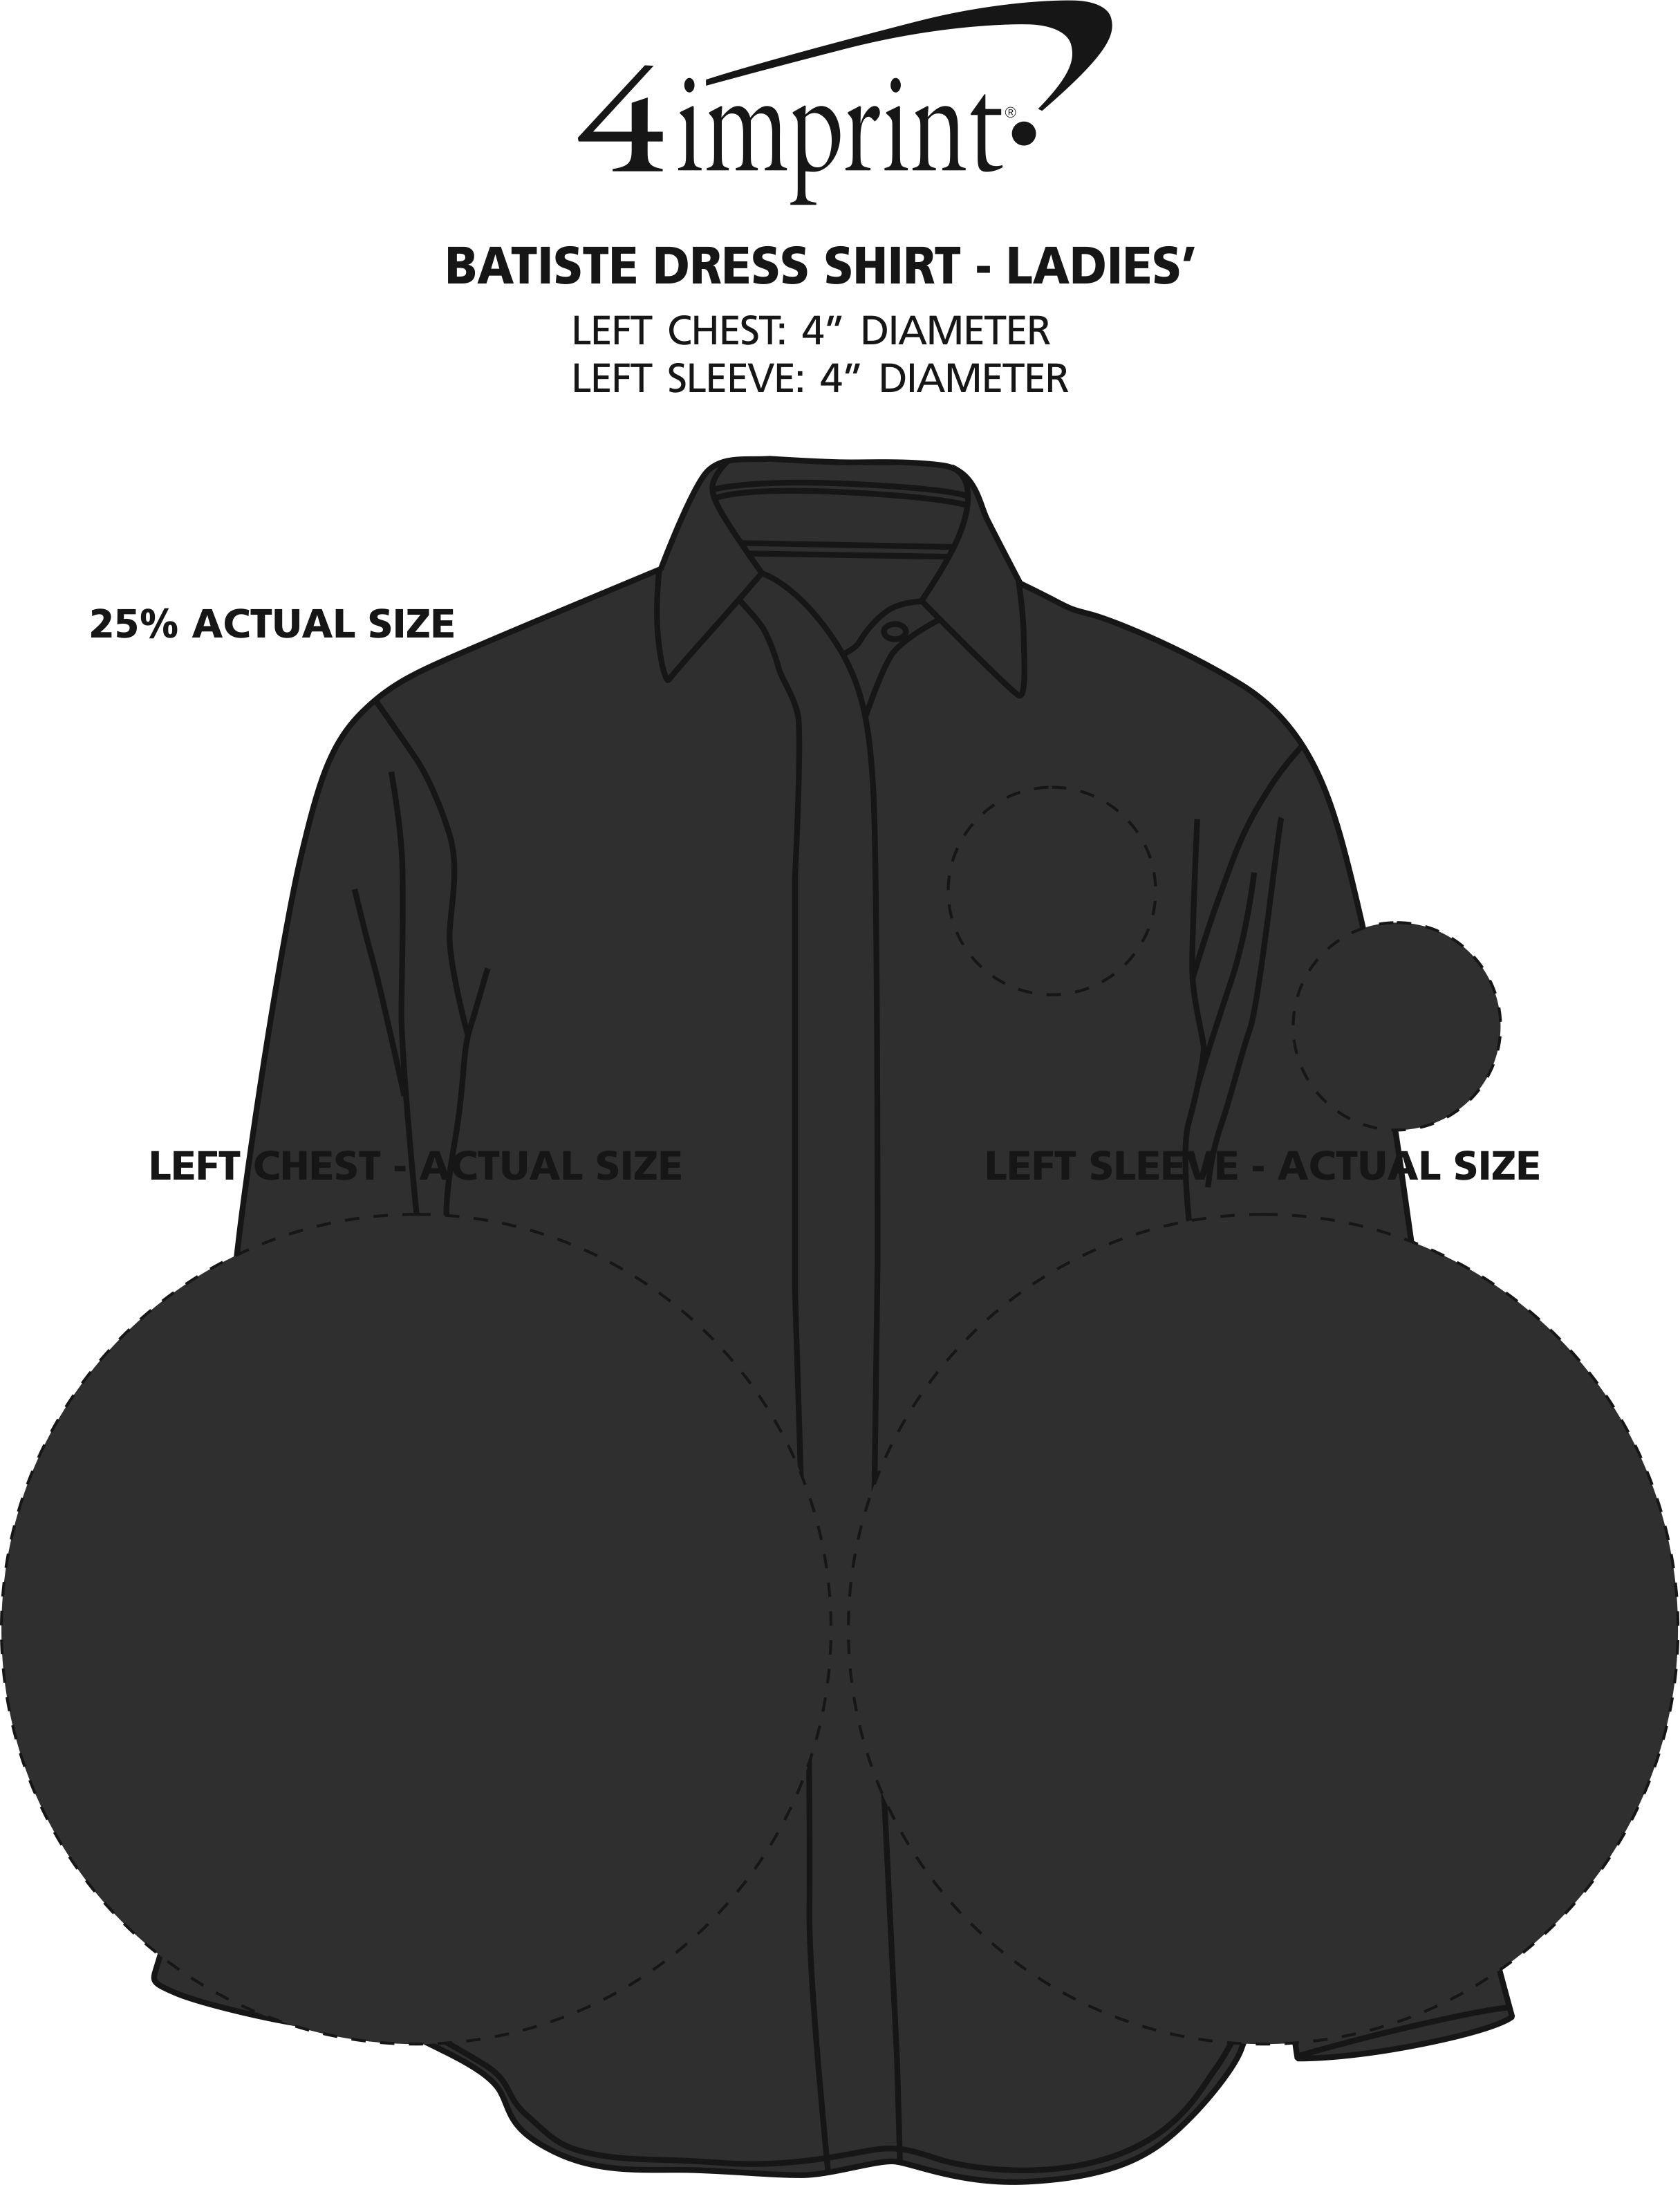 Imprint Area of Batiste Dress Shirt - Ladies'